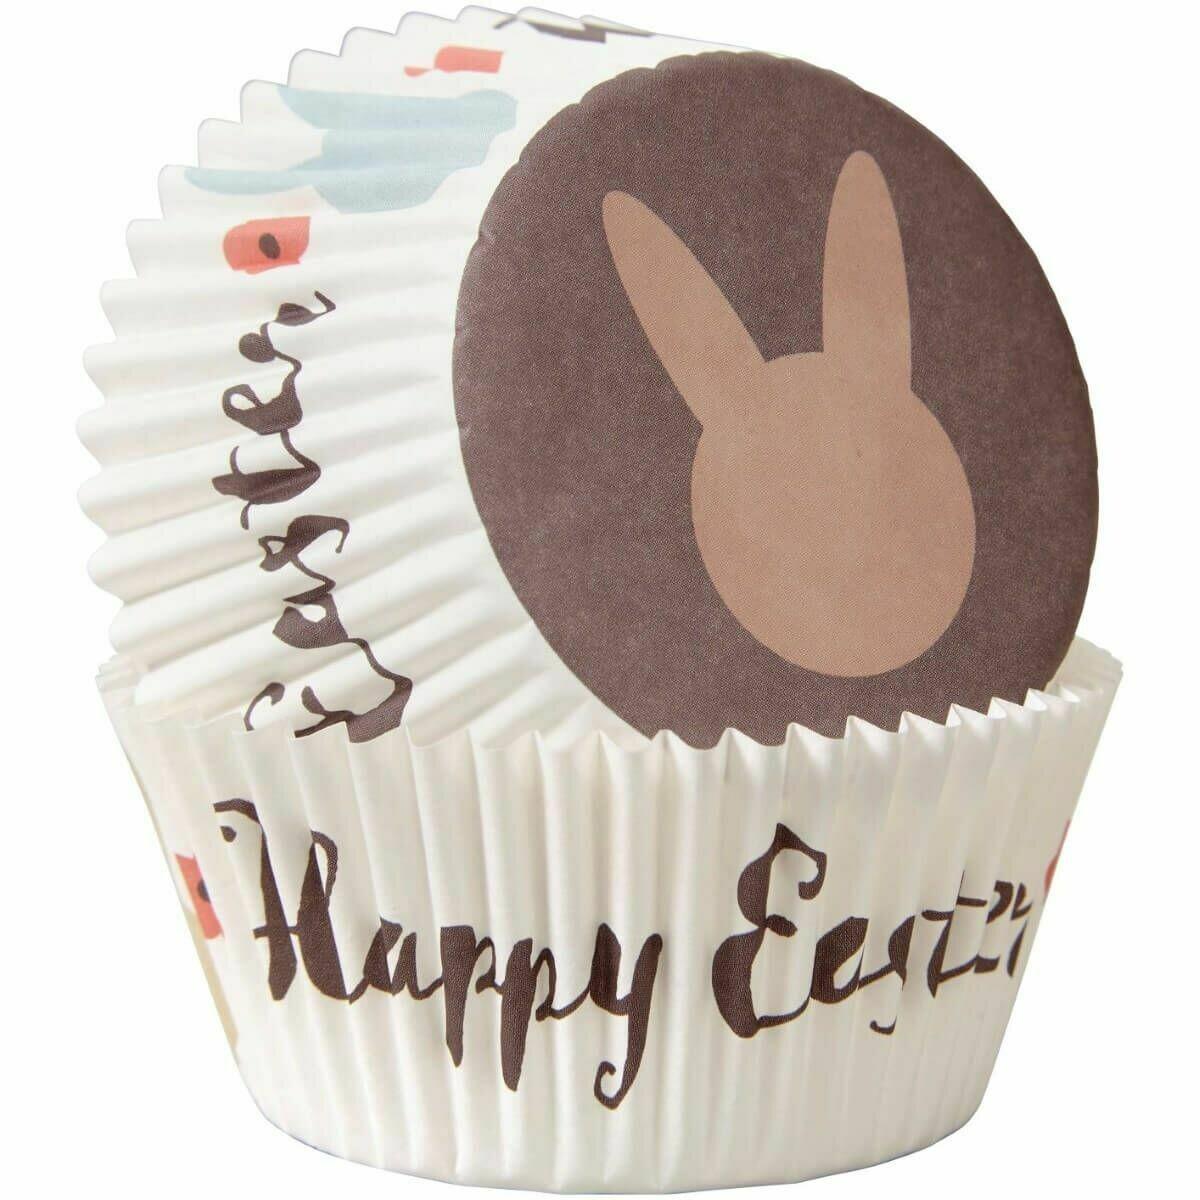 SALE!!! Wilton Easter Cupcake Cases -HAPPY EASTER - Θήκες ψησίματος Καπκέικ/Μάφιν Καλό Πάσχα 75 τεμ